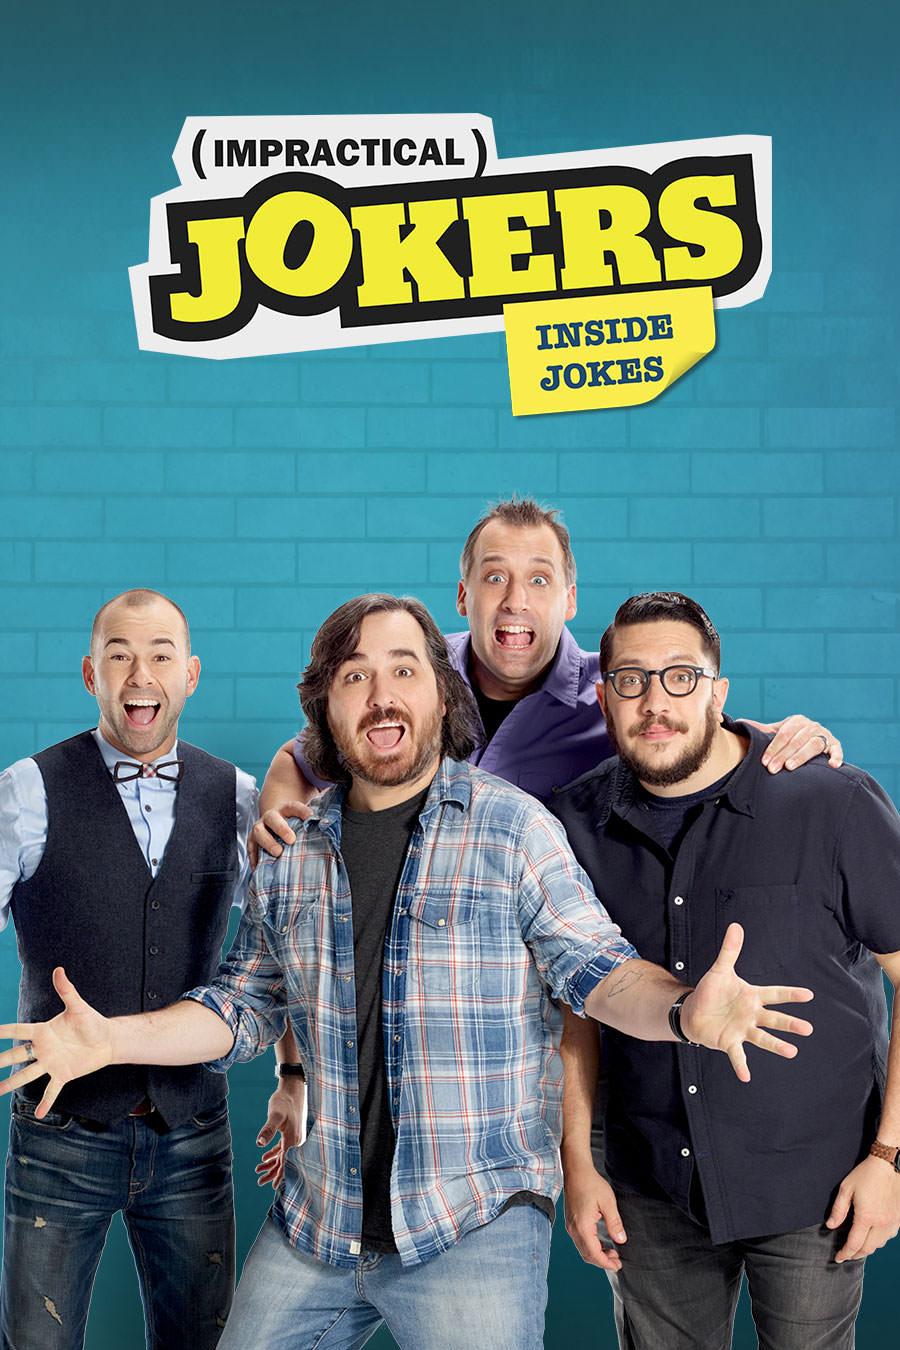 Impractical jokers inside jokes tv series 2016 imdb m4hsunfo